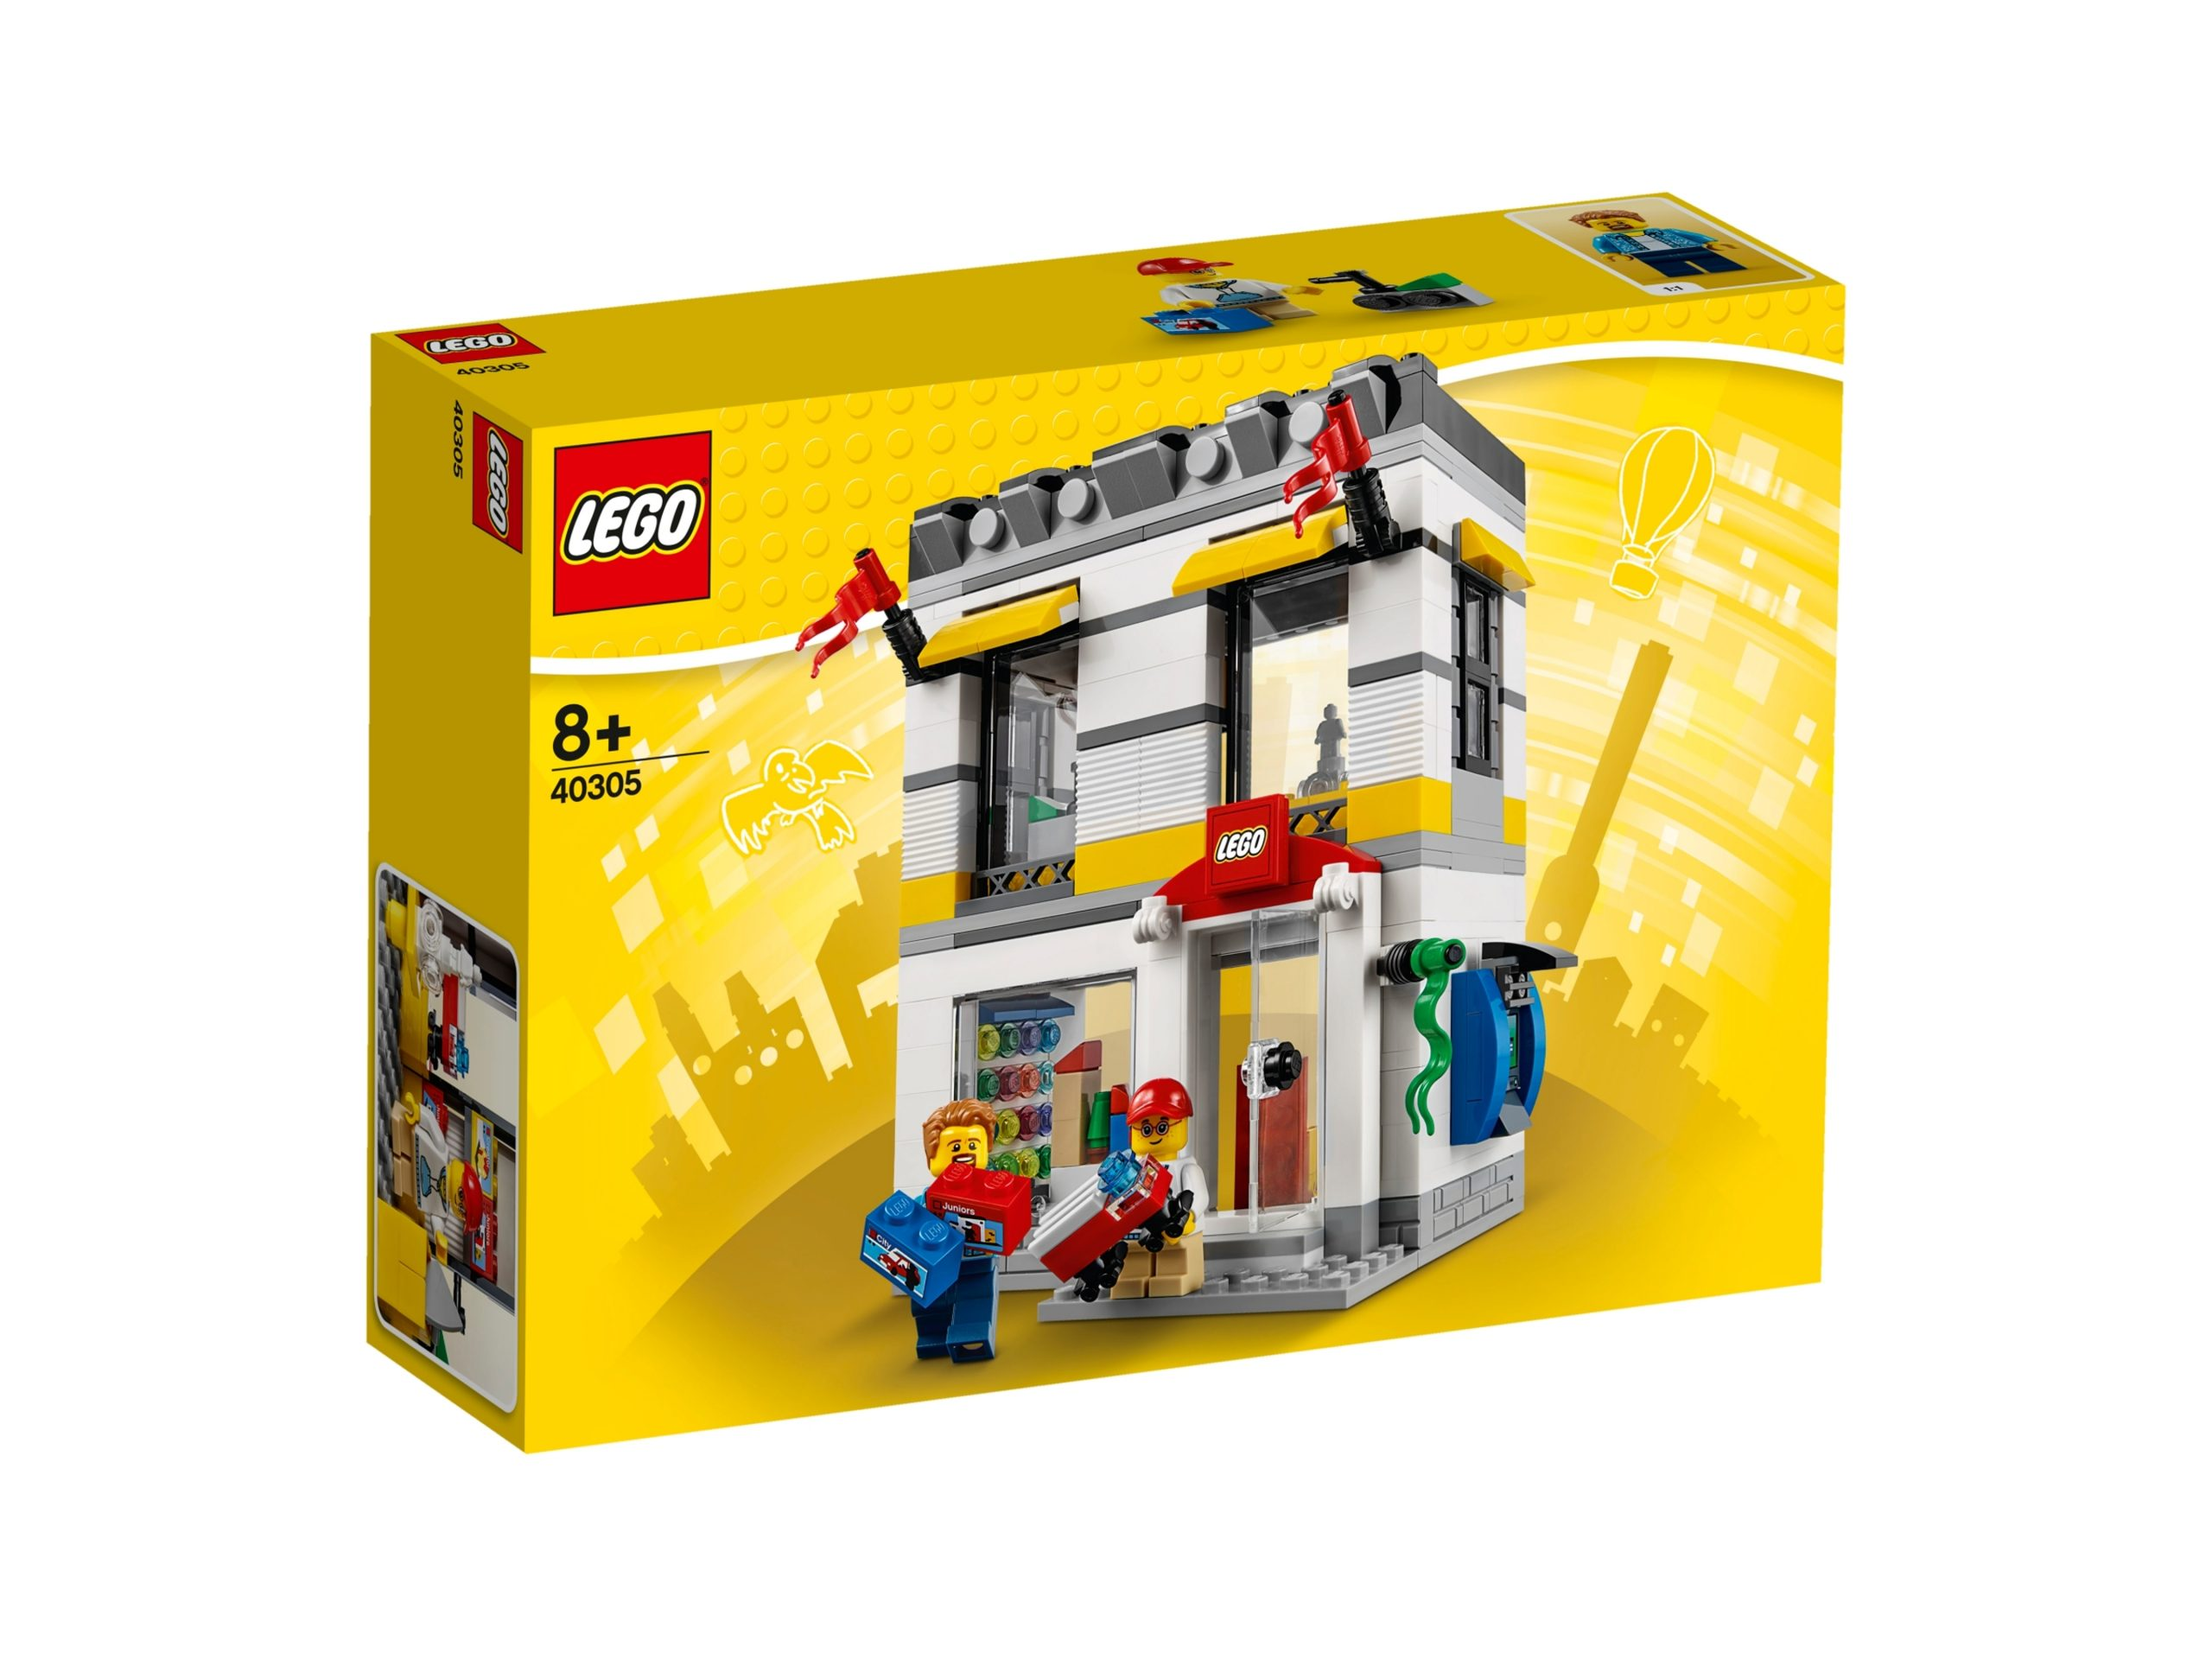 lego 40305 geschaft im miniformat scaled